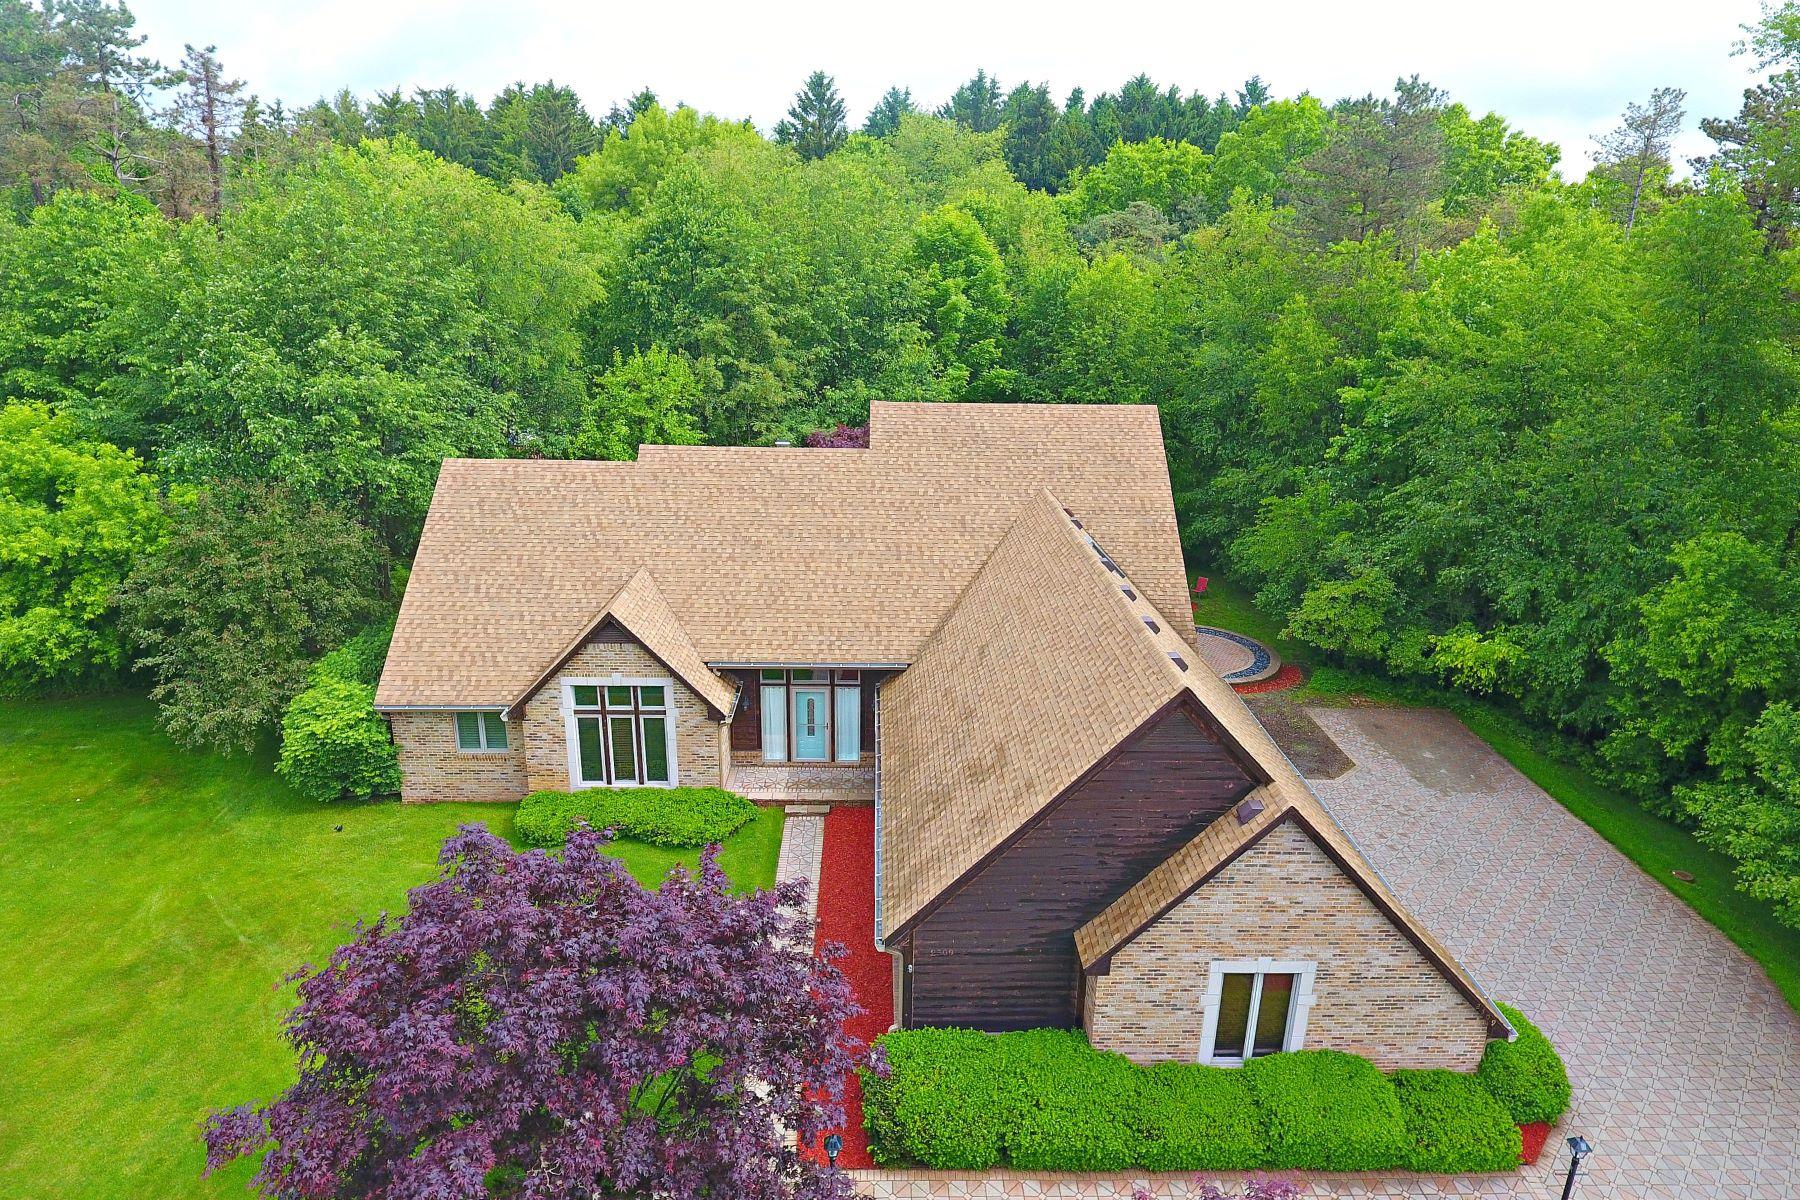 Single Family Homes for Sale at Hamburg Township 2309 Whispering Pines Dr. Hamburg, Michigan 48169 United States